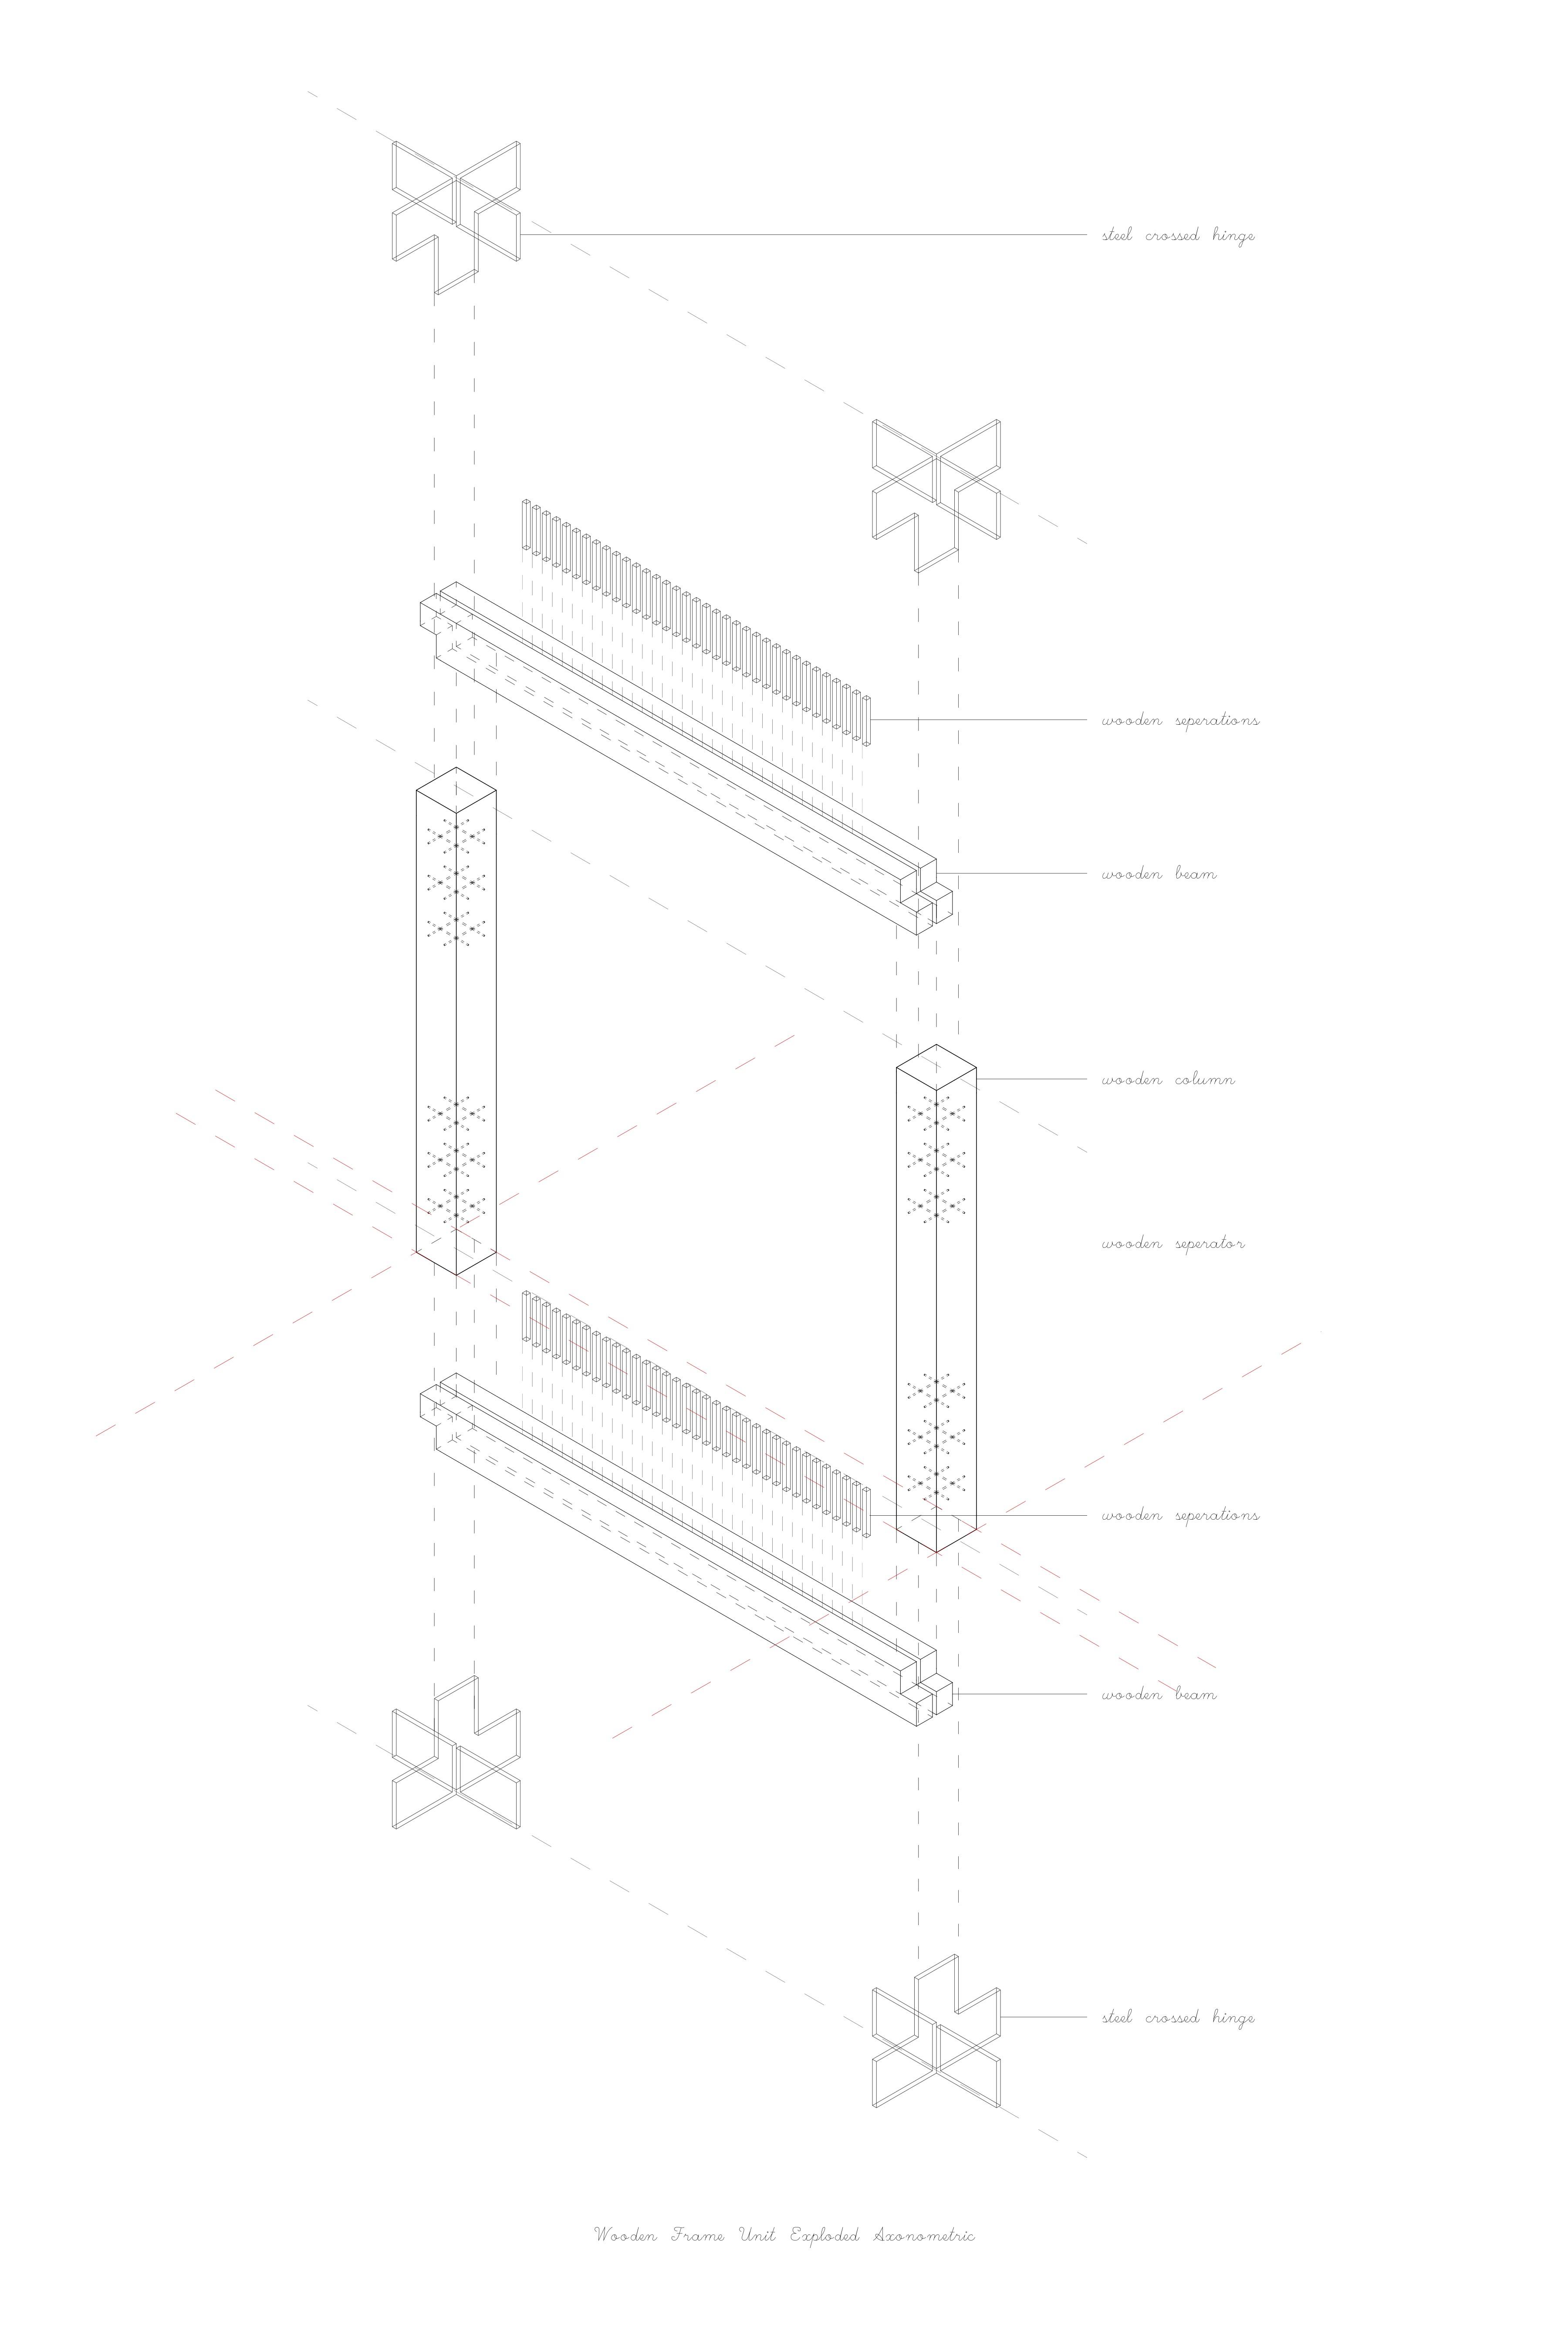 The modular configuration